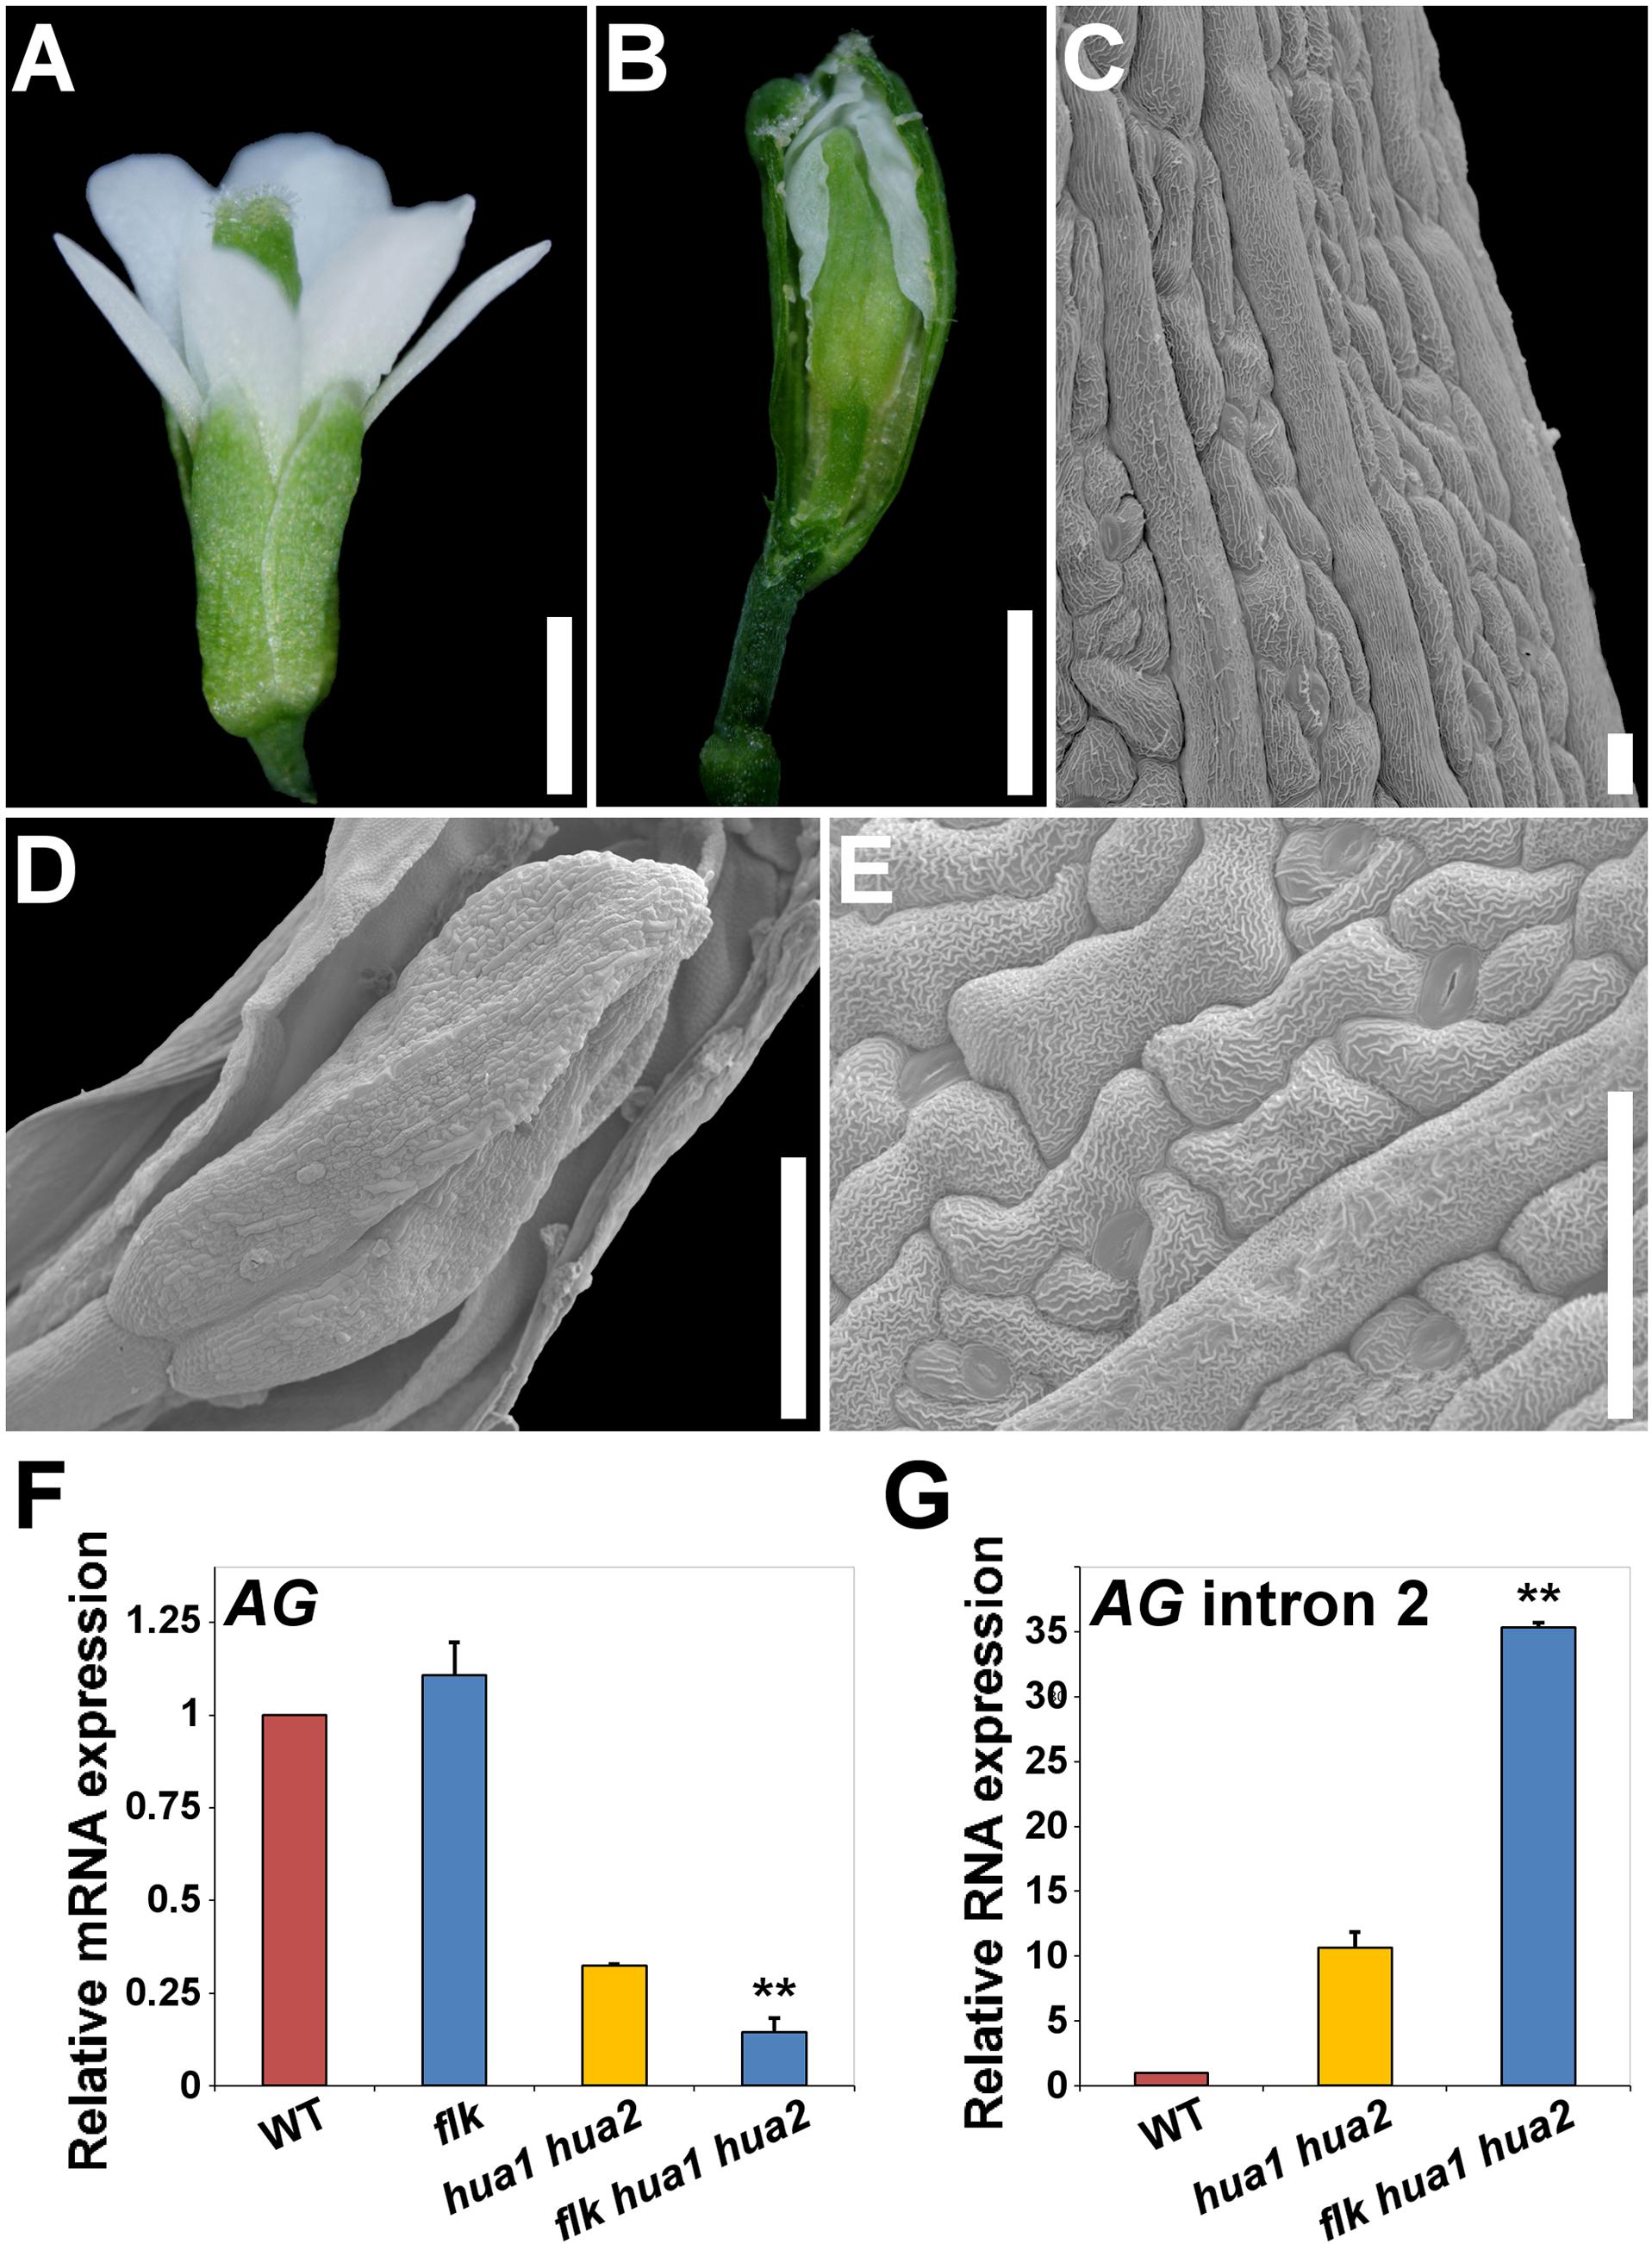 Loss of <i>FLK</i> dramatically enhances the floral phenotypes of <i>hua1 hua2</i> plants.